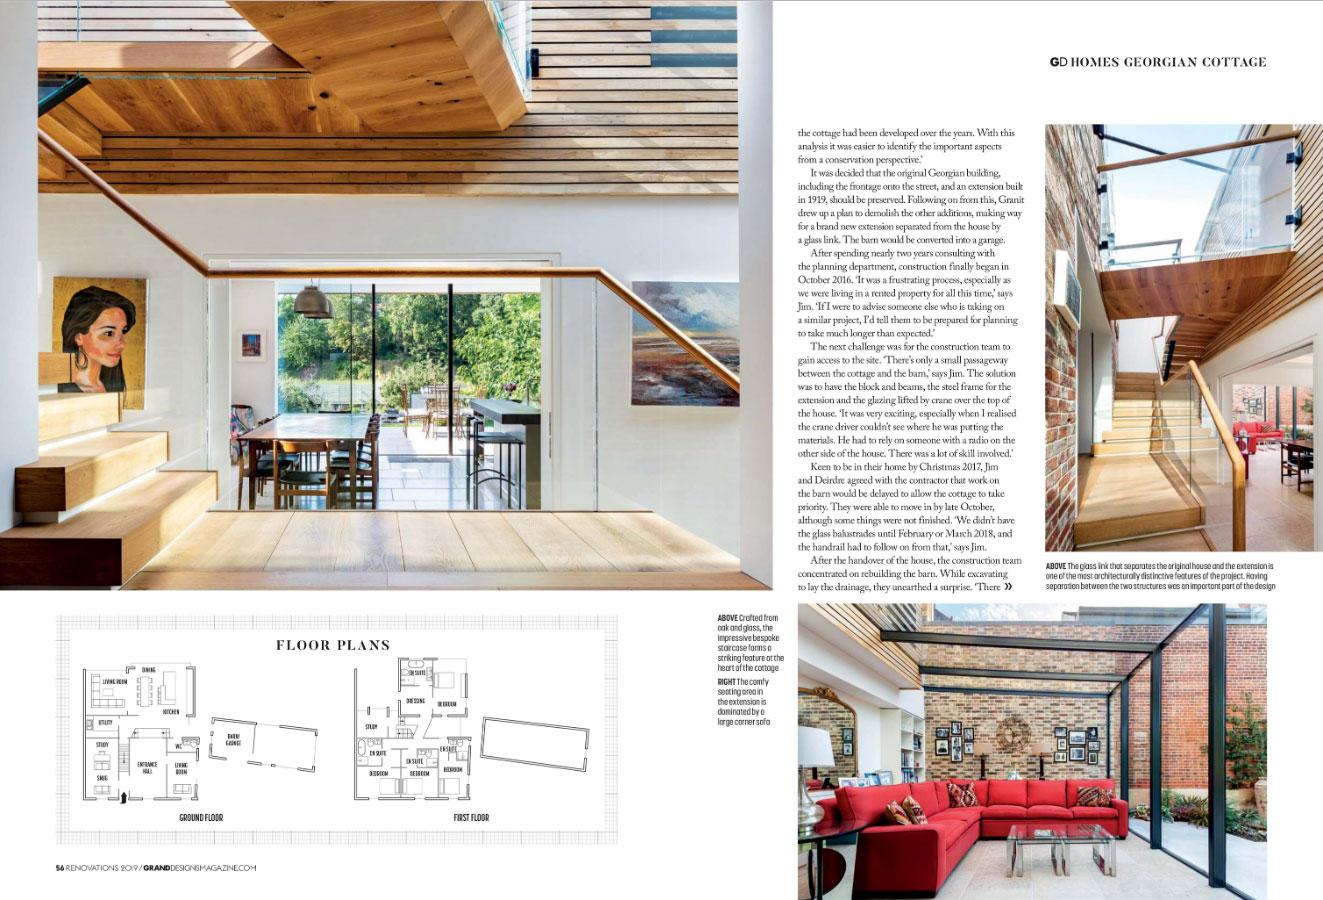 GRAND DESIGNS - COVER SHOT - SPECIAL EDITION 2019 4